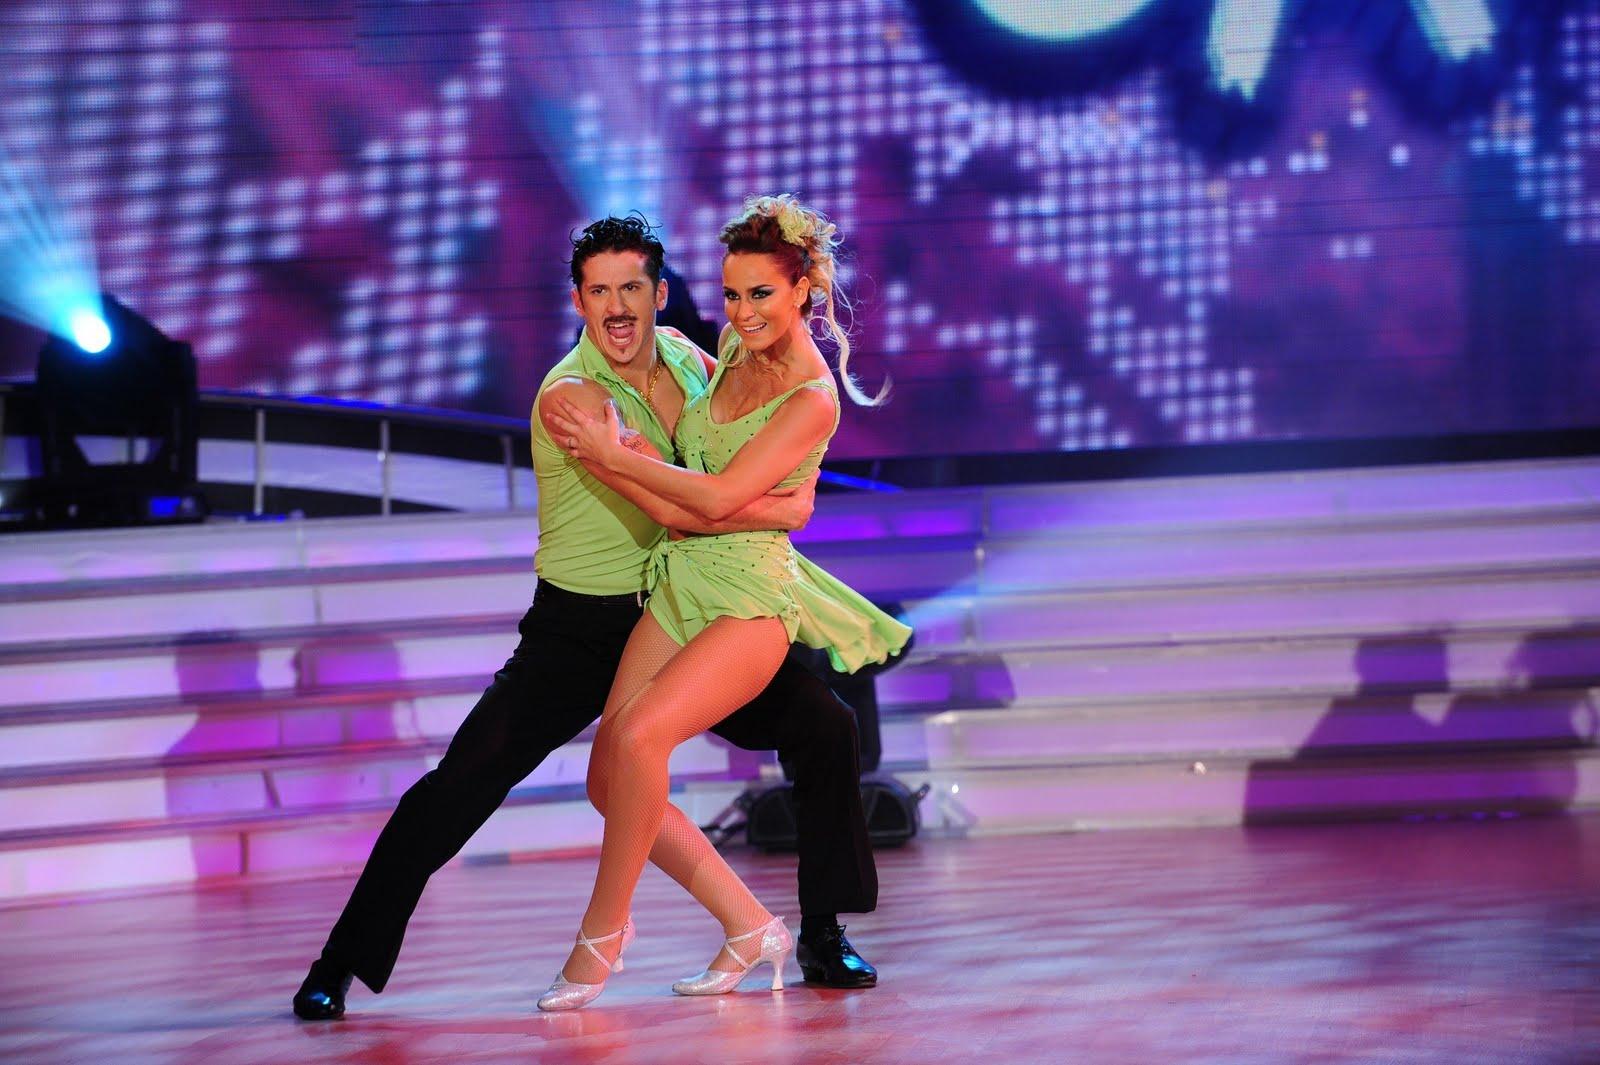 Bailando bailando 2010 ver todas